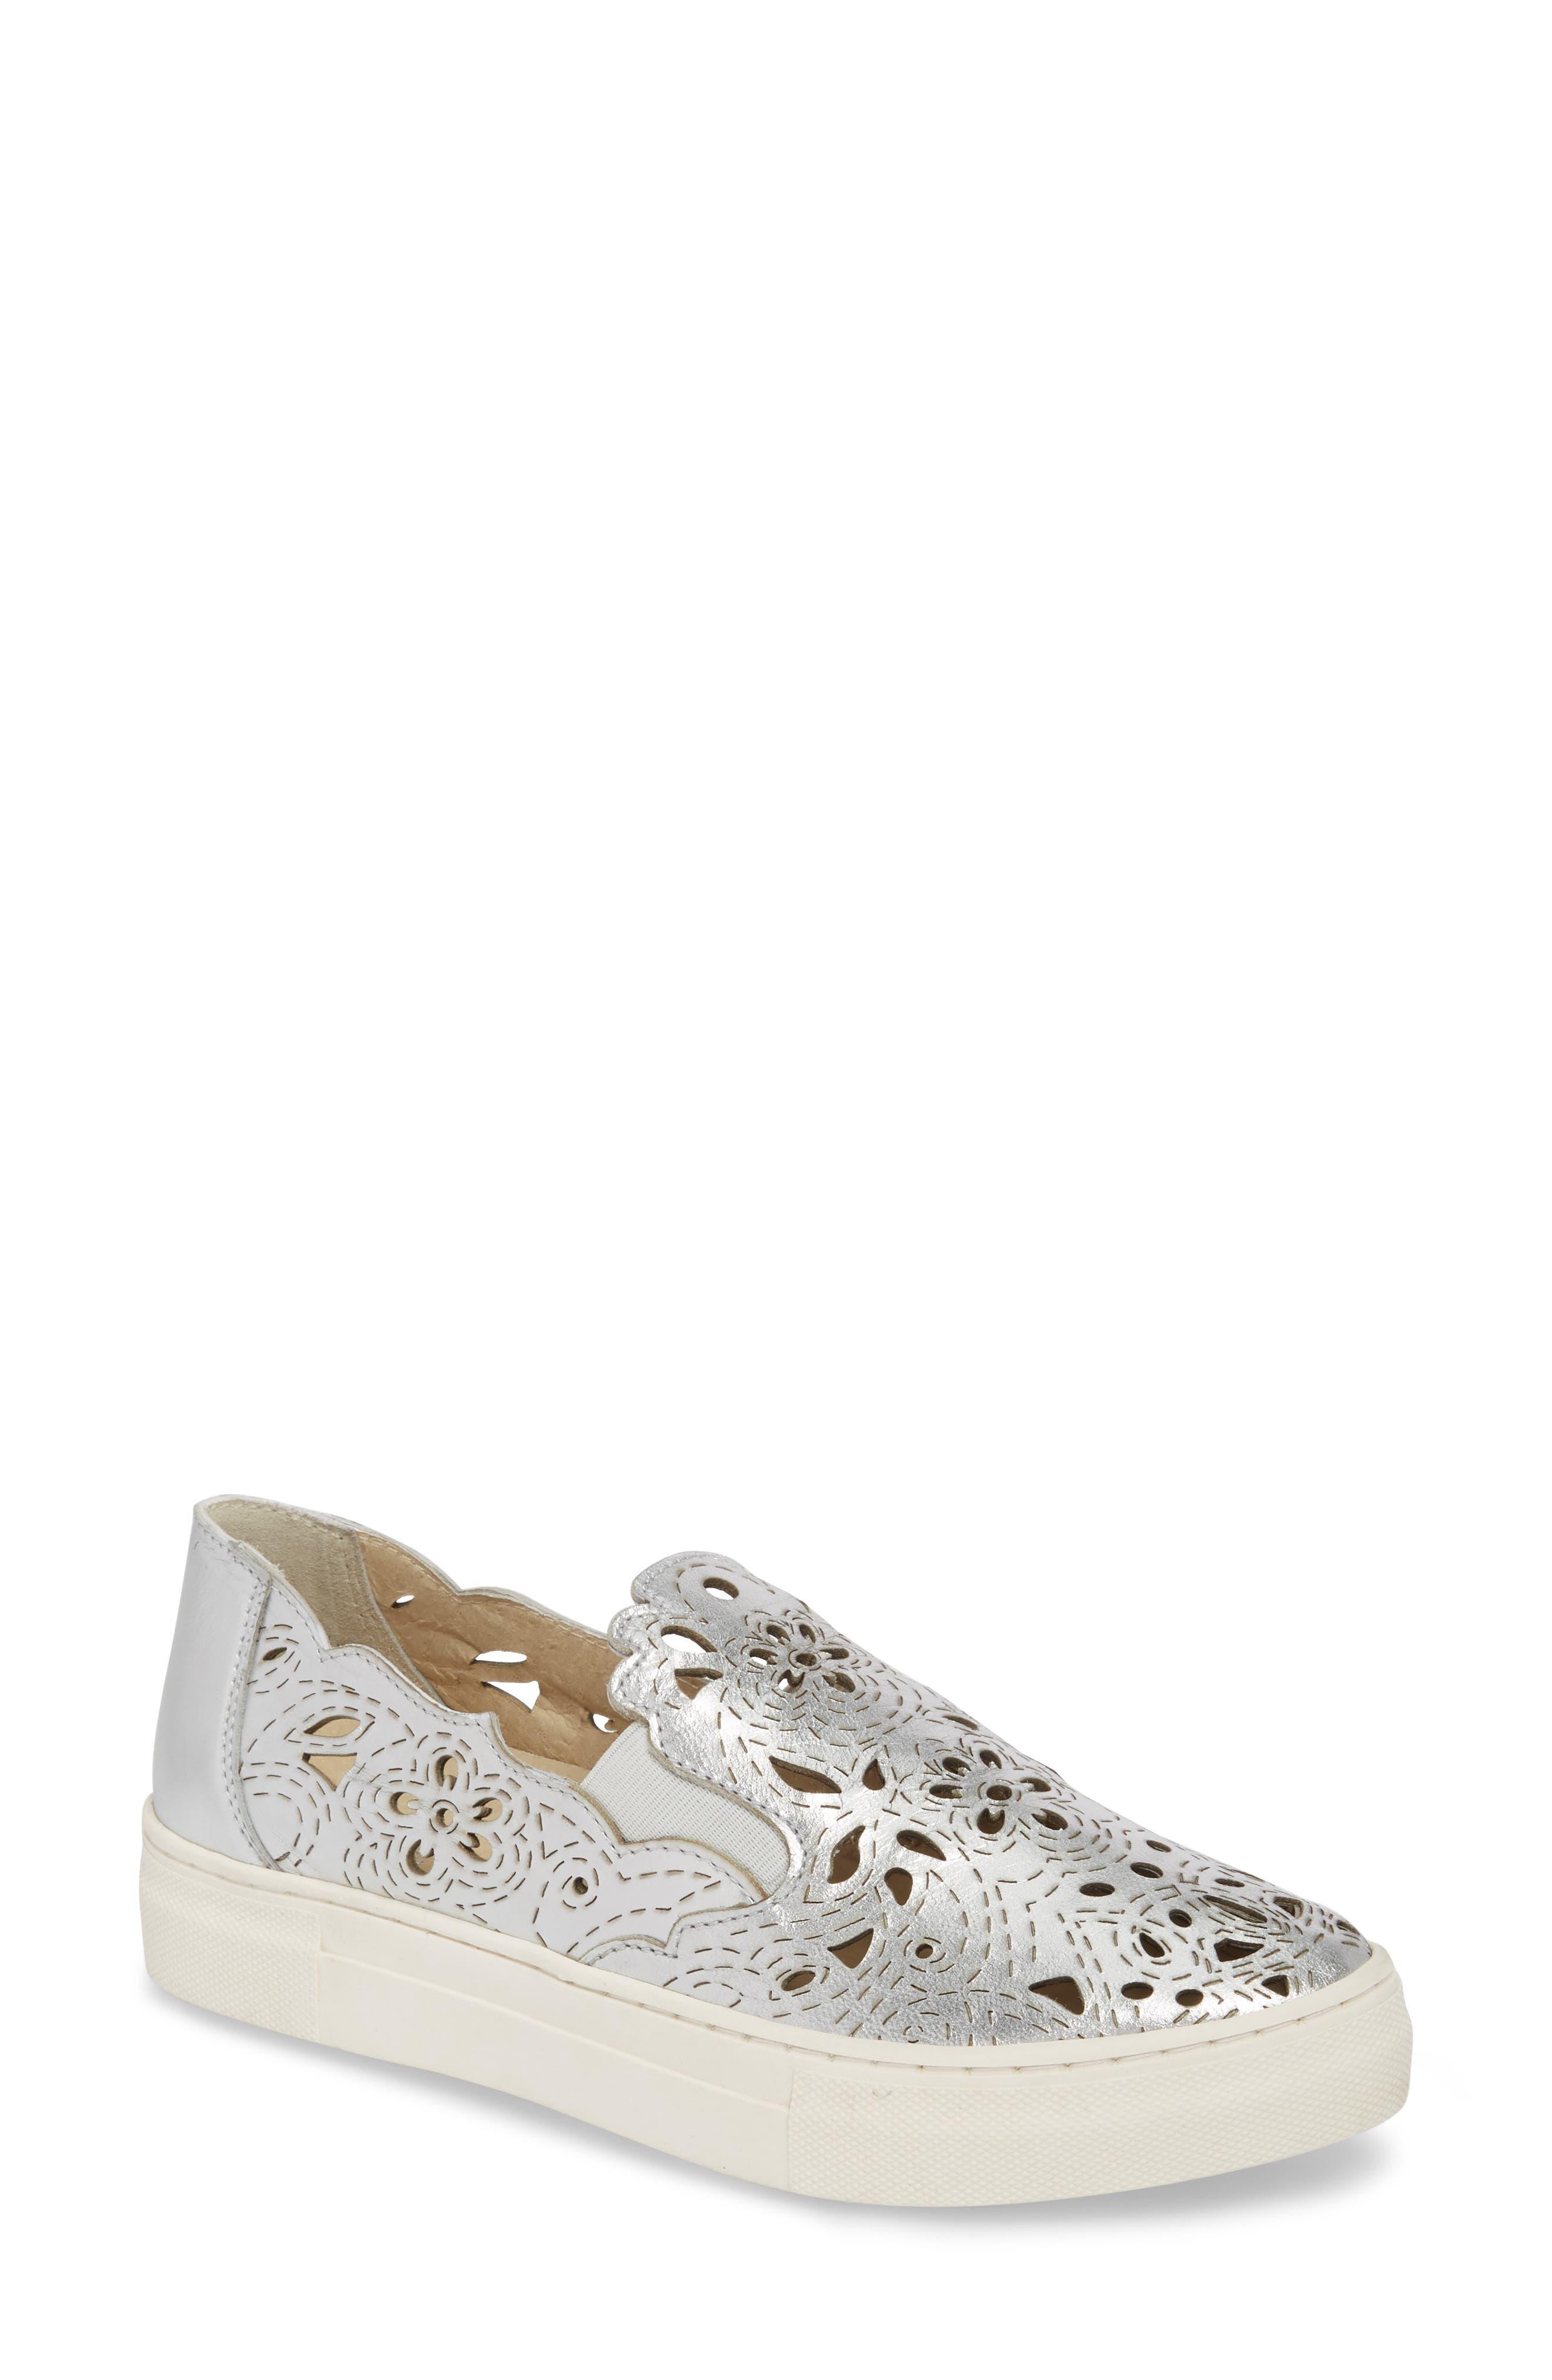 Even Better Laser Cutout Slip-On Sneaker,                         Main,                         color, 040